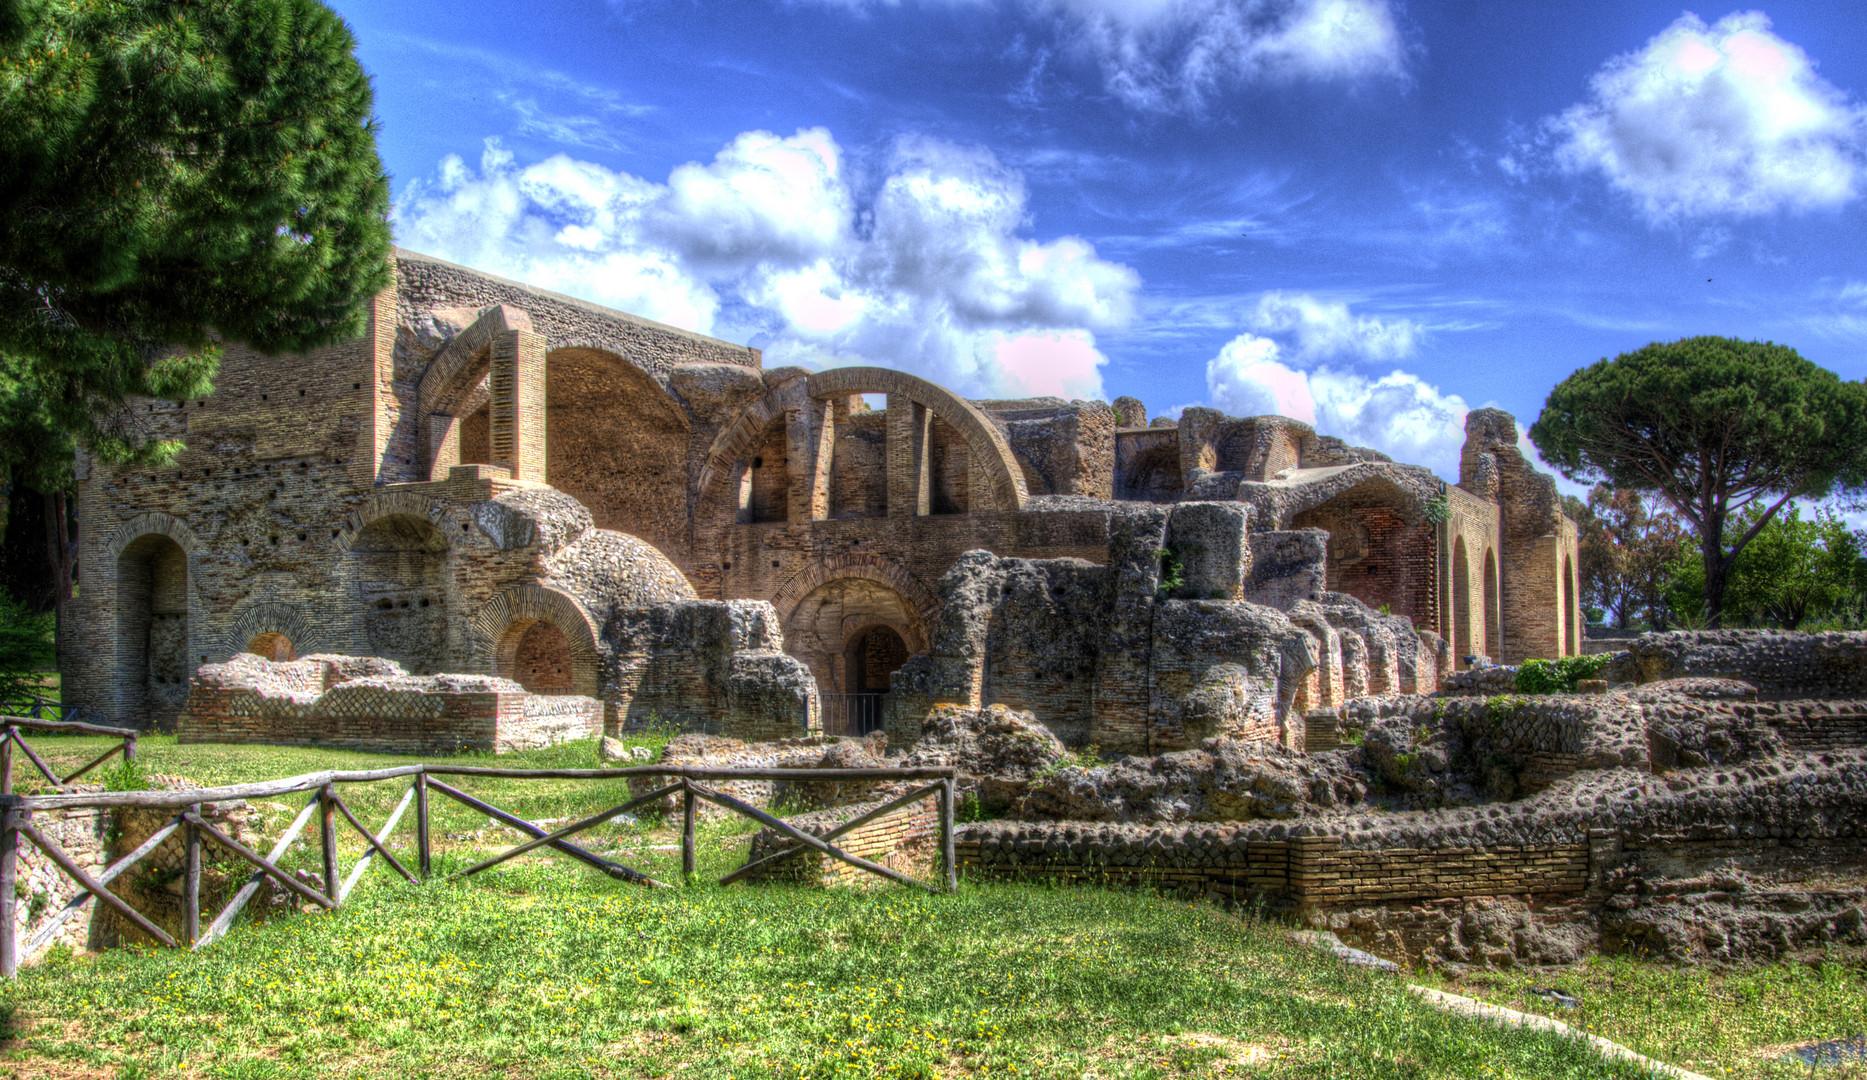 Terme romane